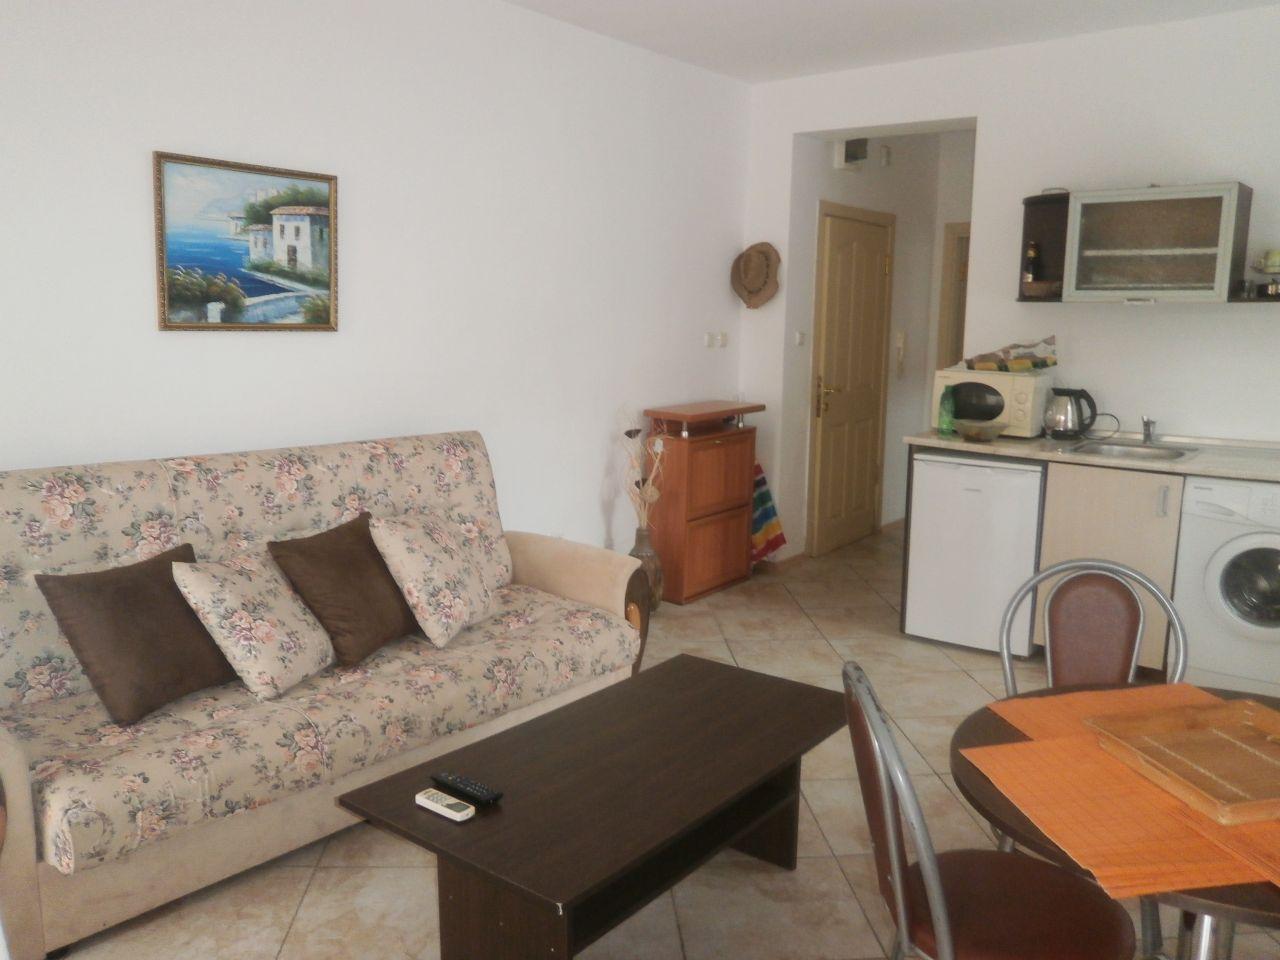 Квартира на Солнечном берегу, Болгария, 60 м2 - фото 1